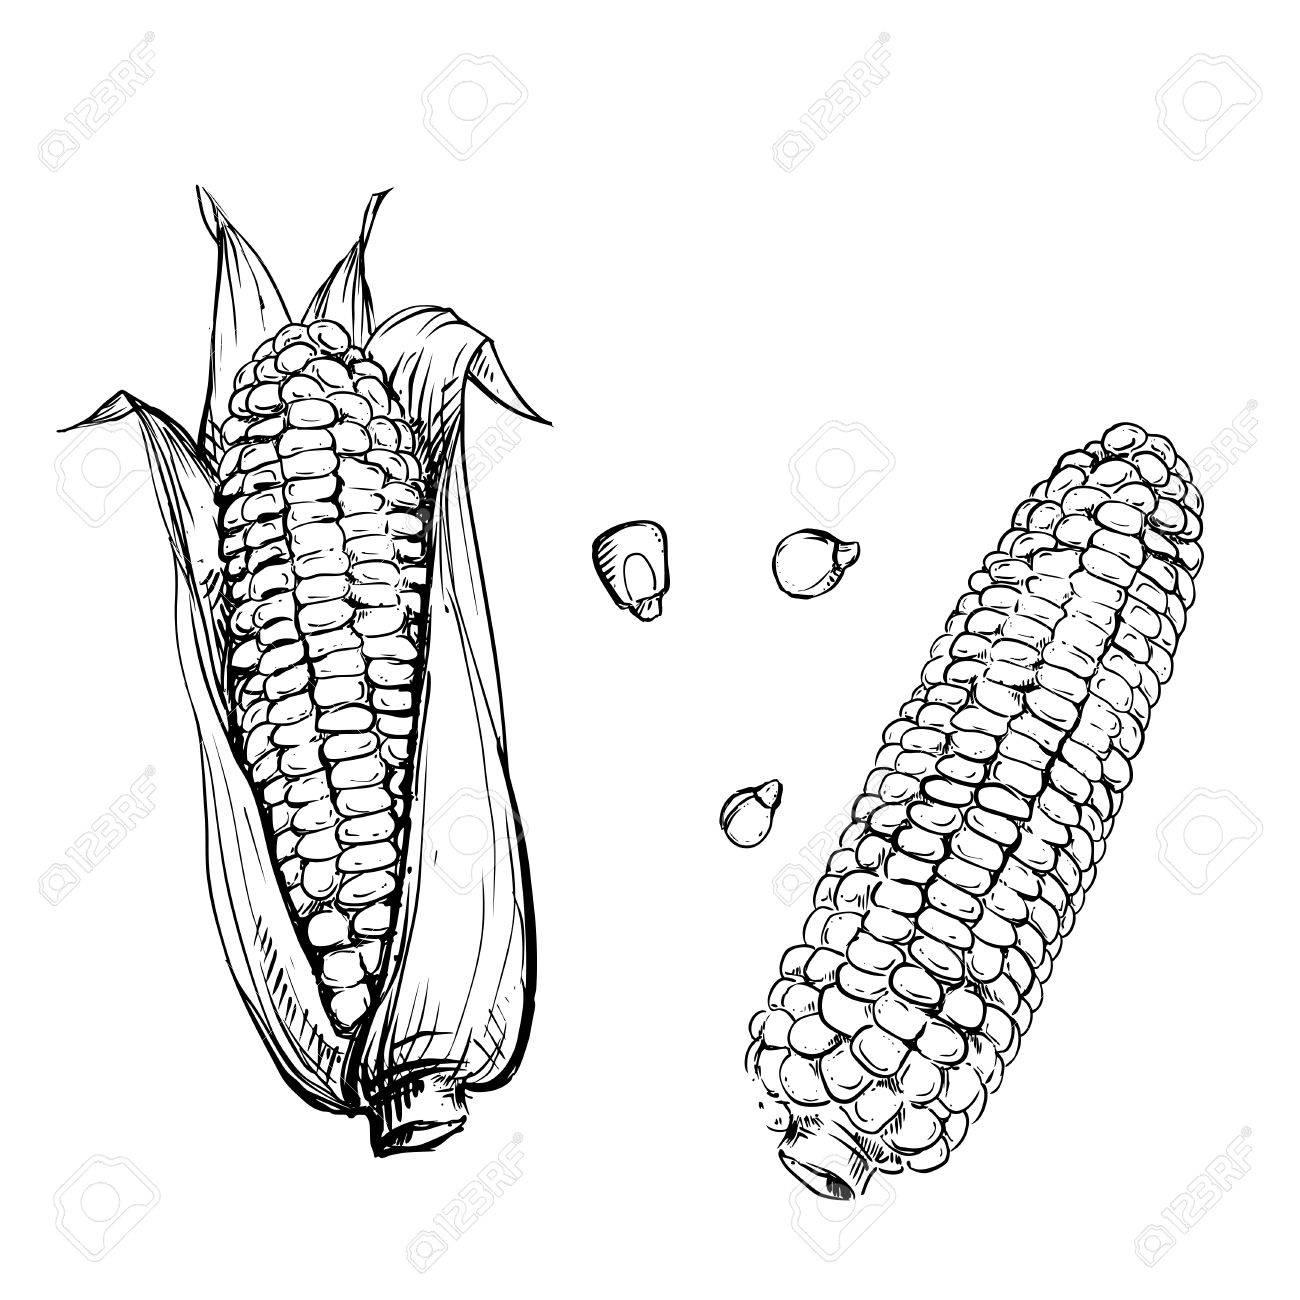 1300x1300 Hand Drawn Vector Illustration Set Of Corn, Grain, Stalk. Sketch